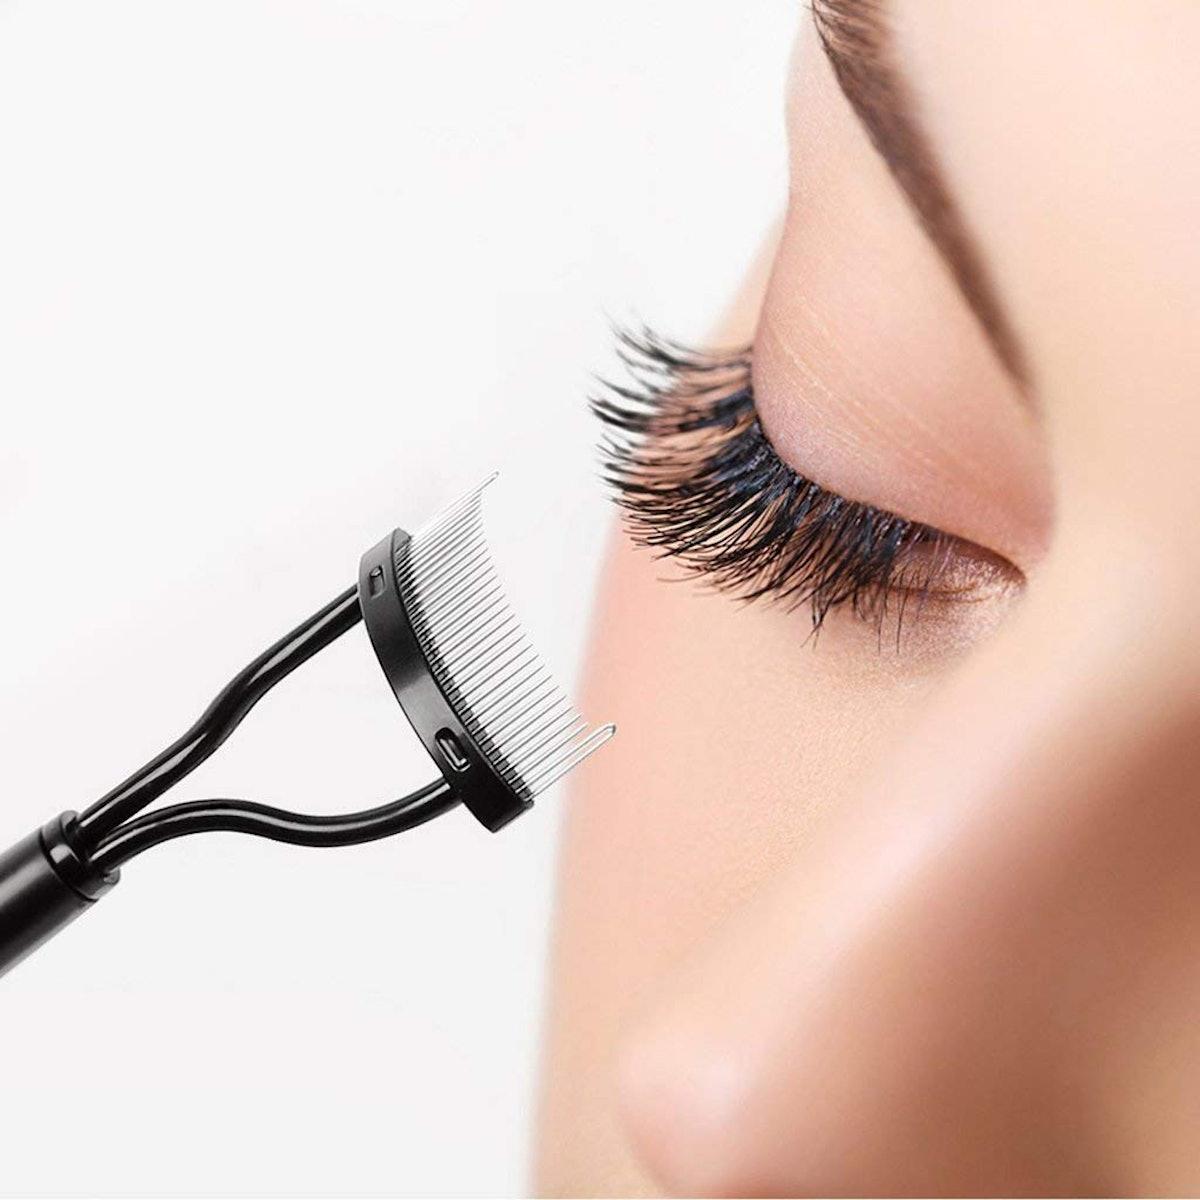 DUcare Eyelash Comb